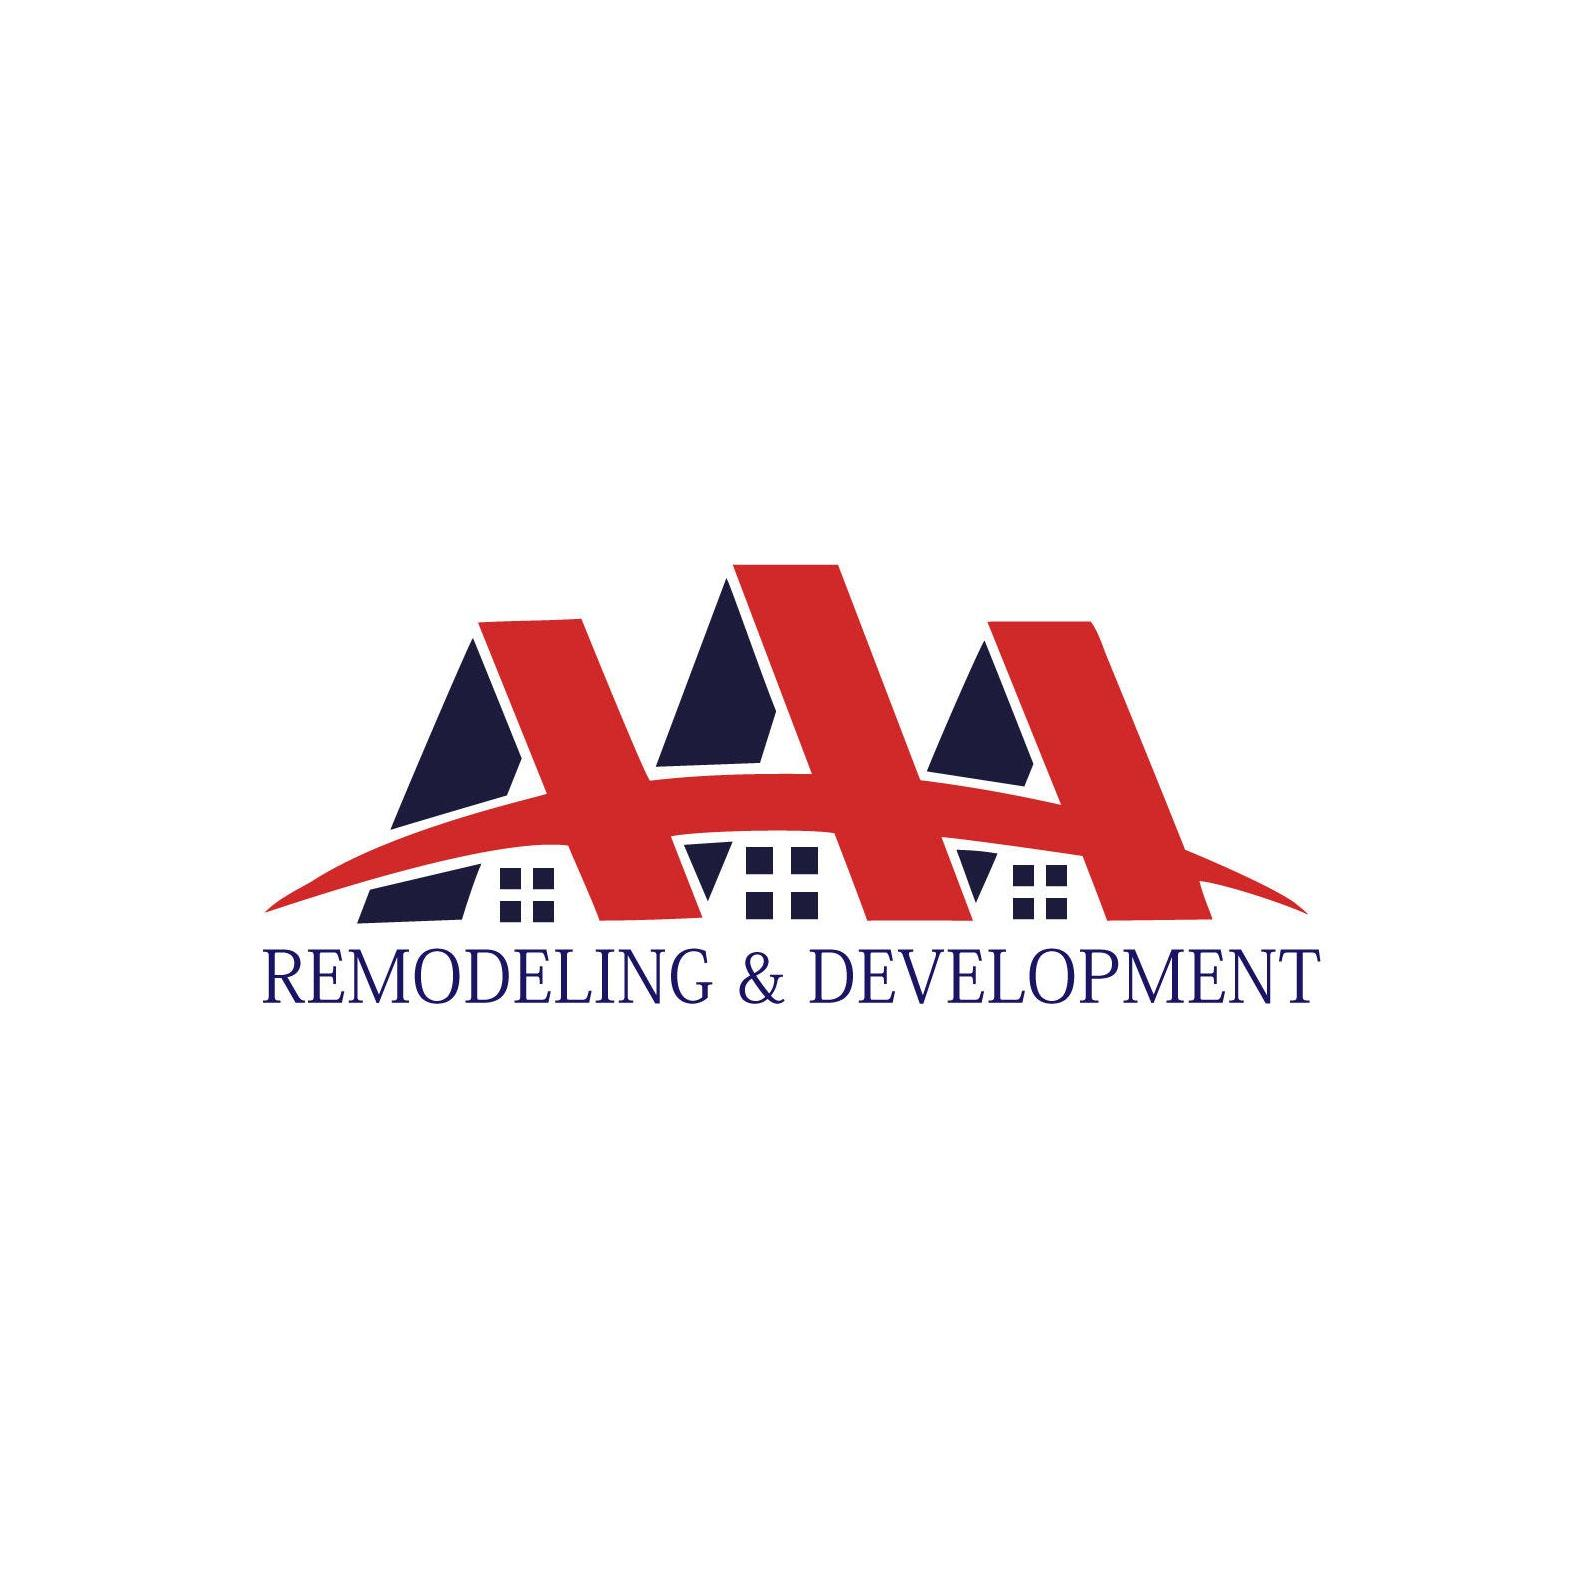 AAA Remodeling & Development